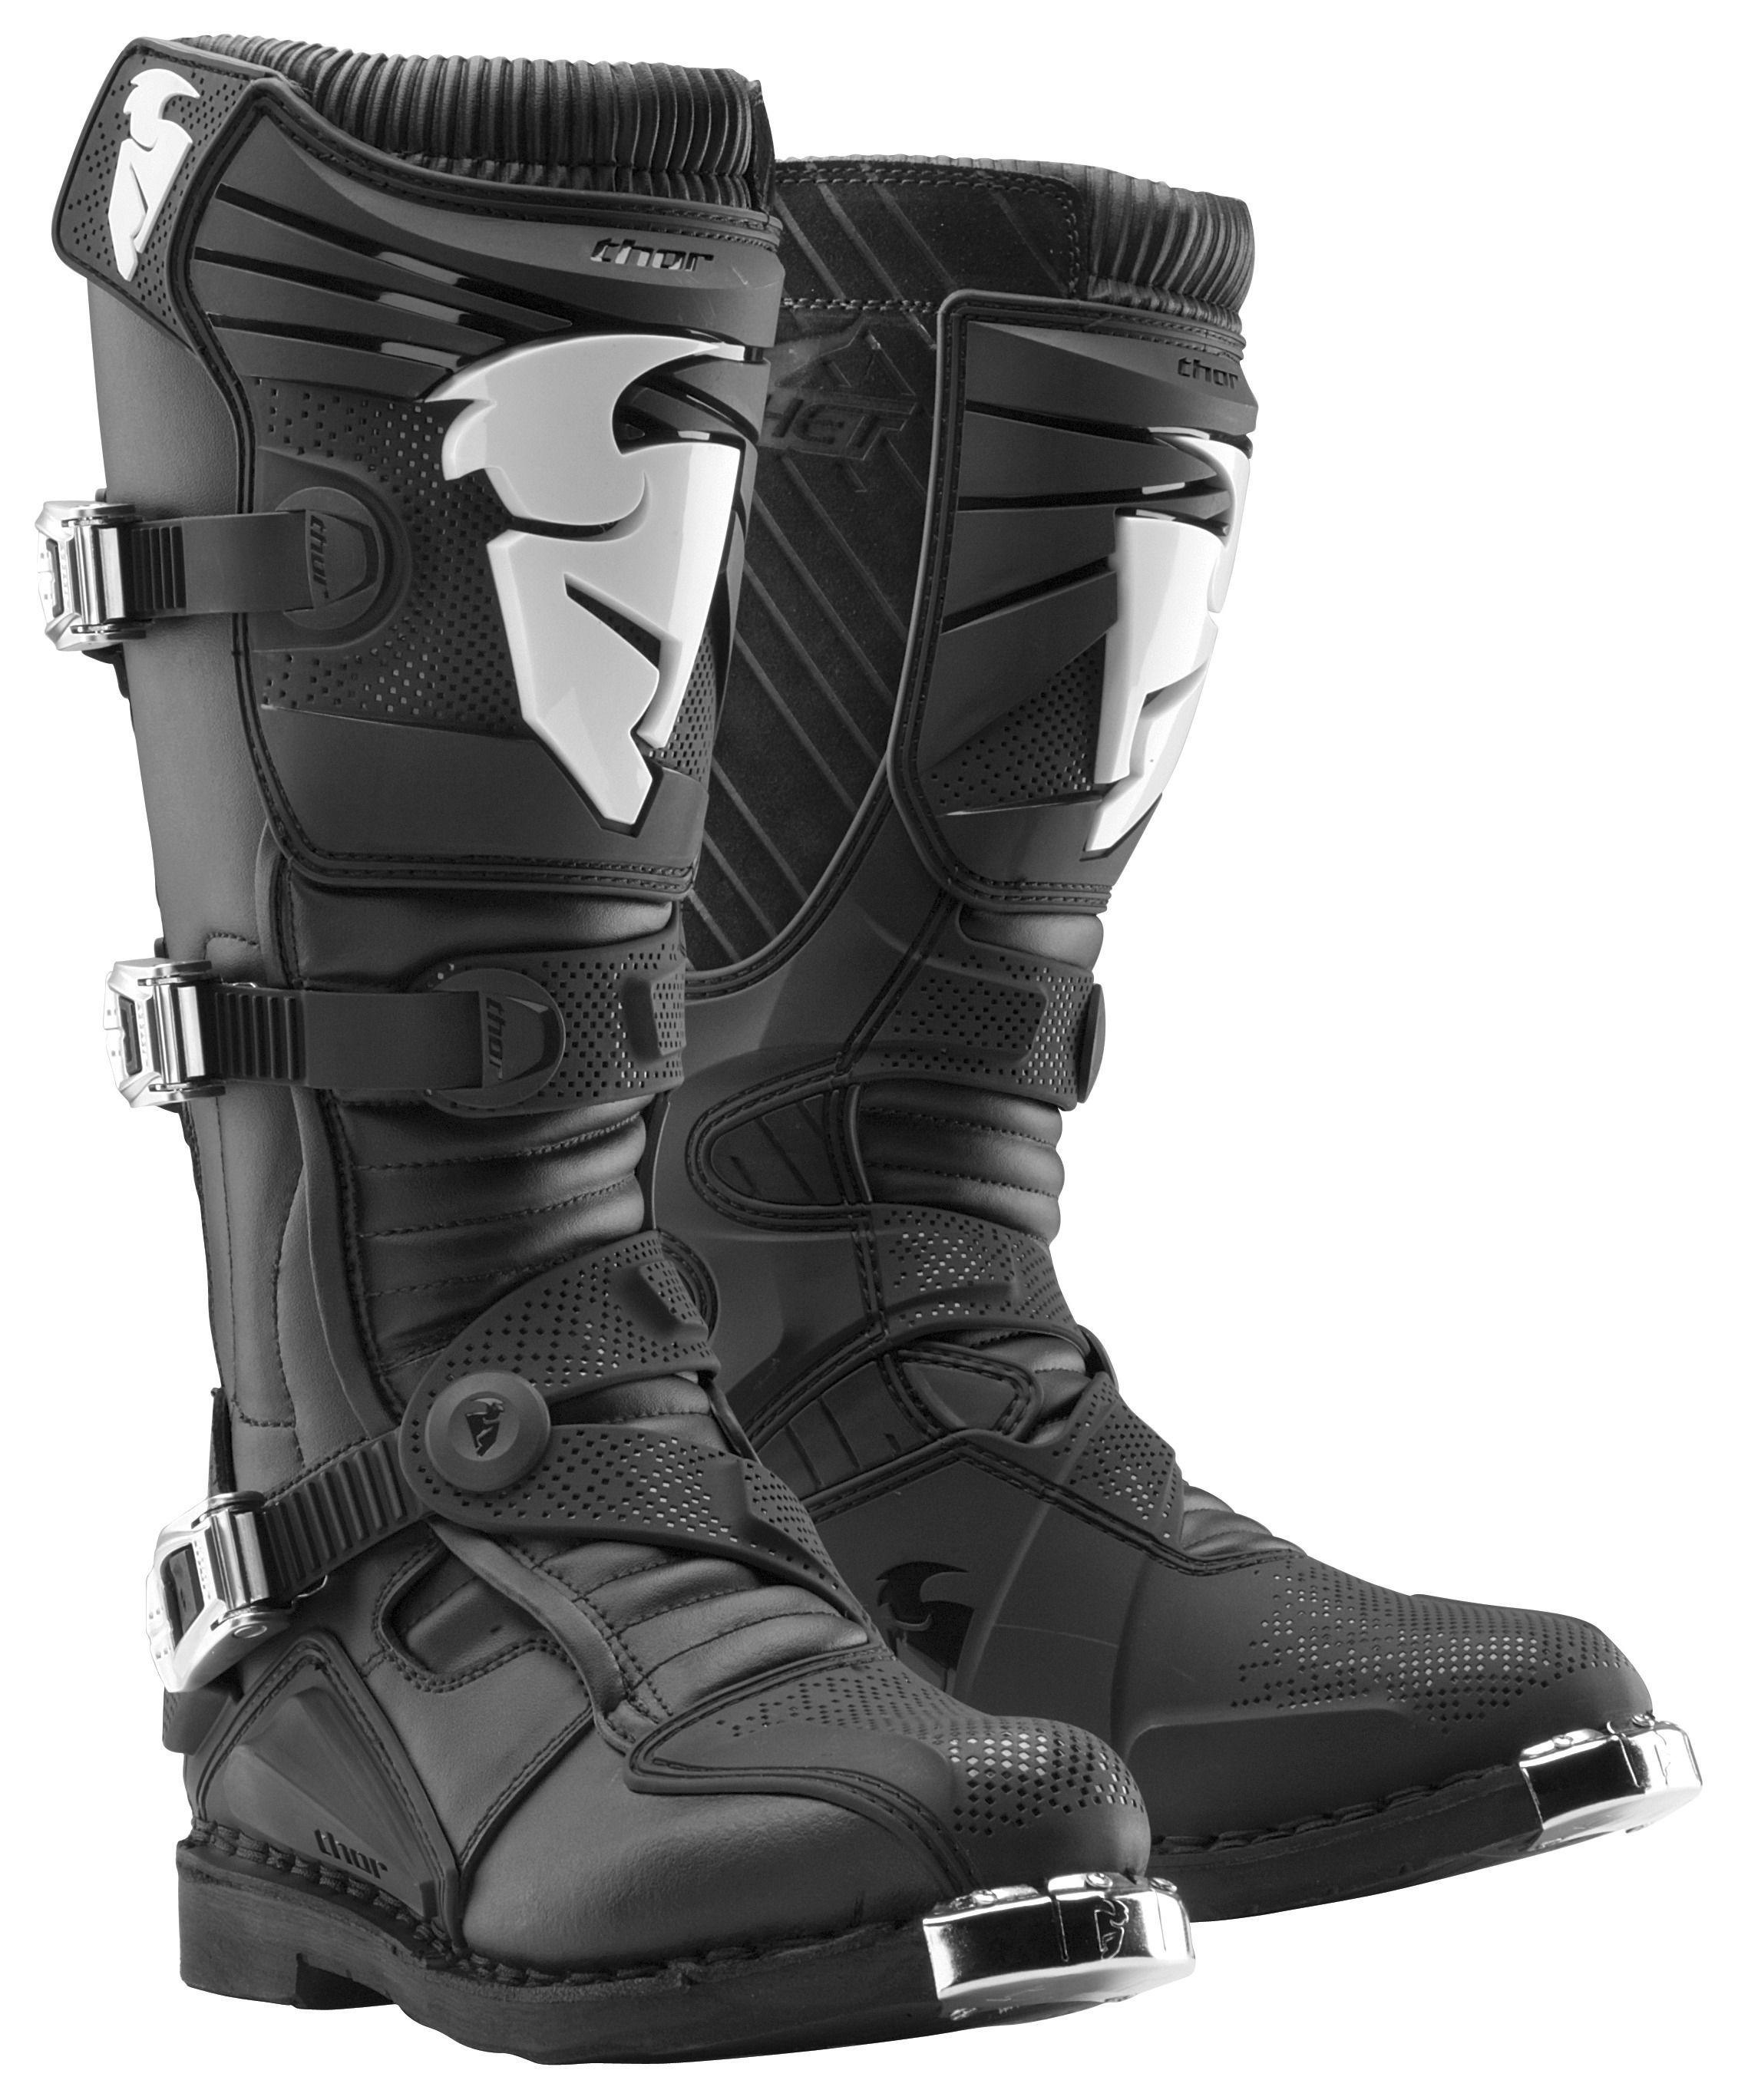 Thor Ratchet Boots 7 20 37 99 Off Bike Boots Dirt Bike Boots Mx Boots